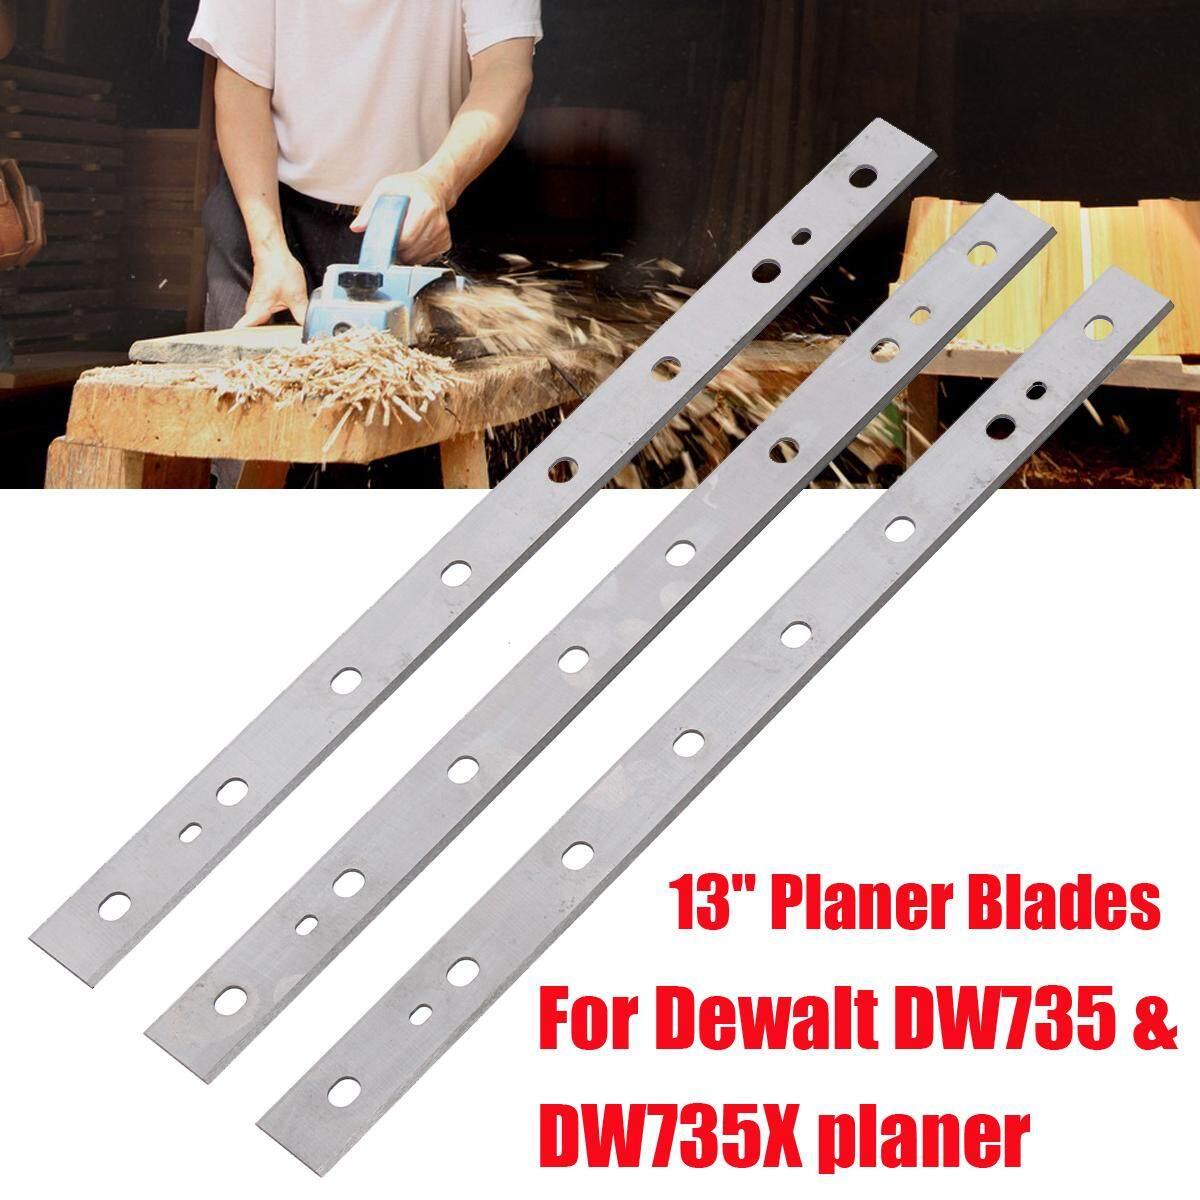 3Pcs 13 332X23X2mm HSS High-Speed Steel Planer Blades For DW735 & DW735X Parts